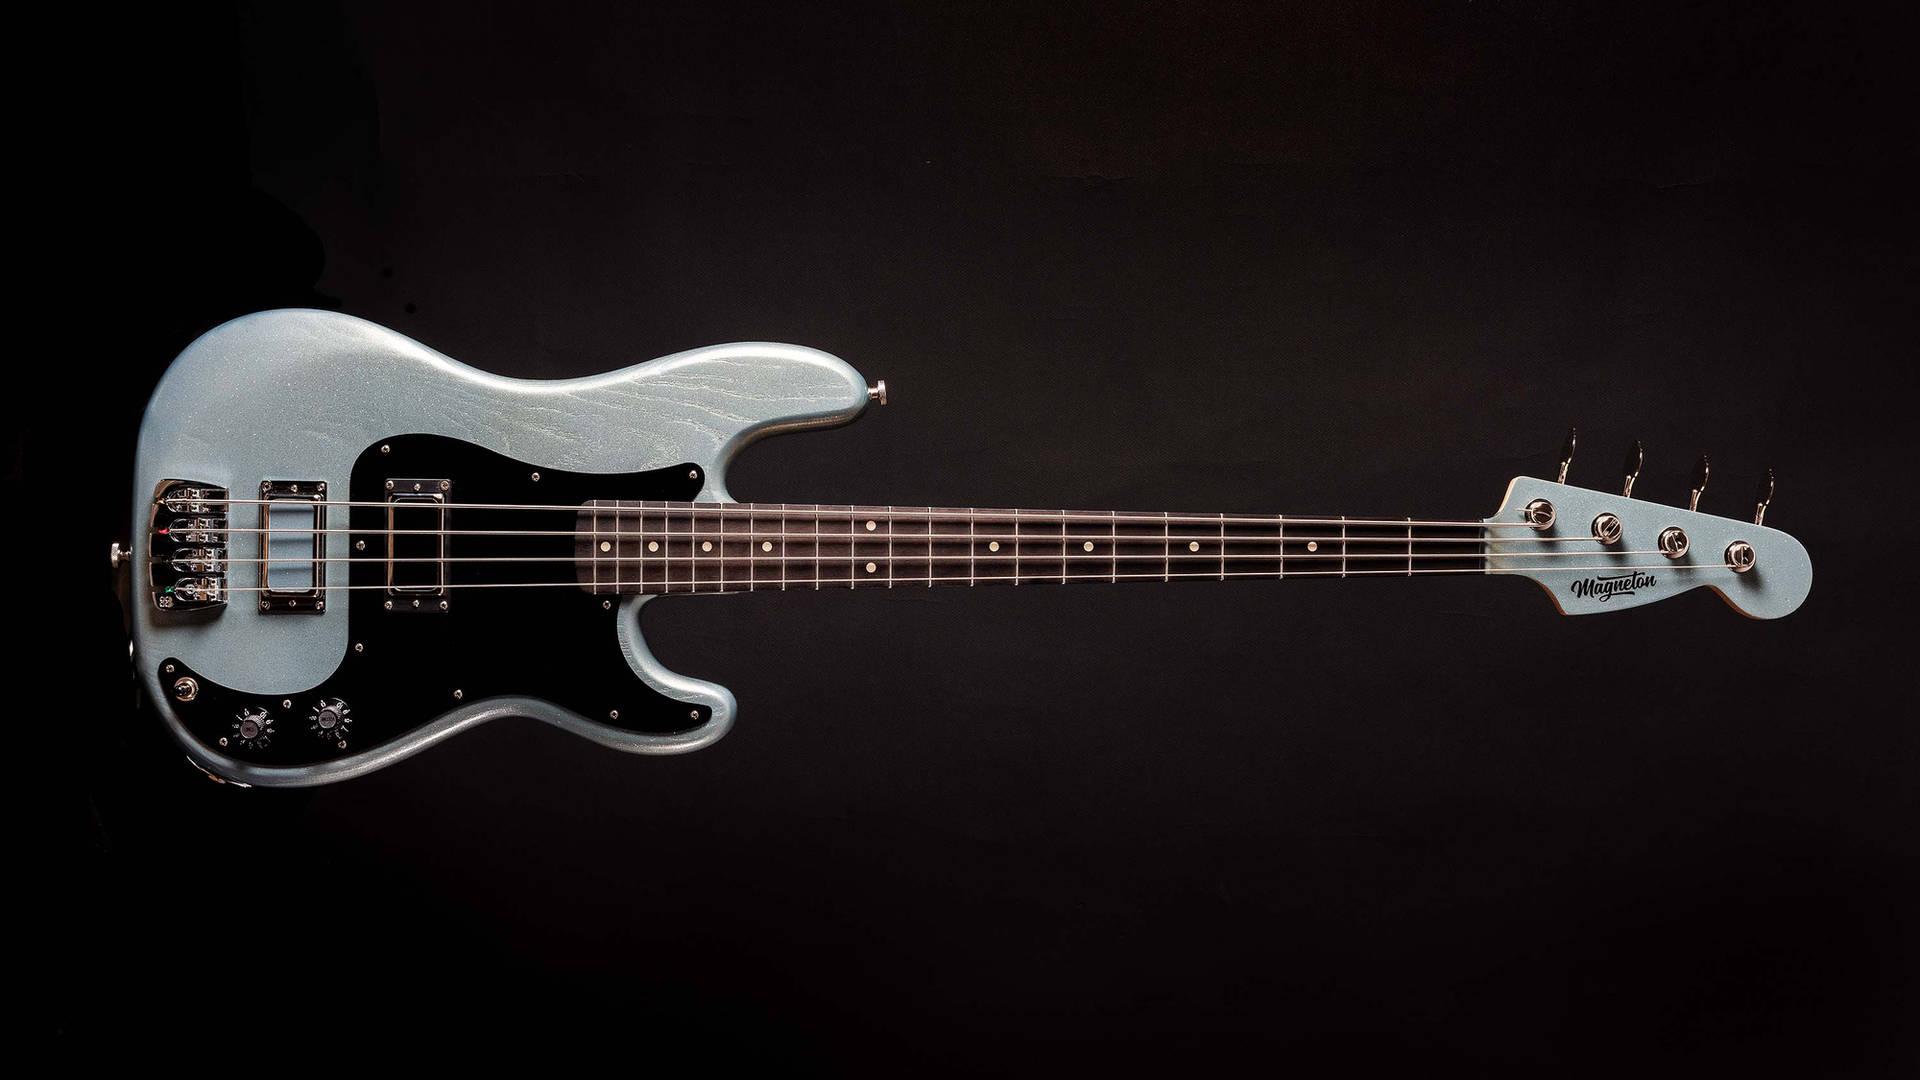 Magneton Priscilla Bass Blue Sparkle Bassbucker